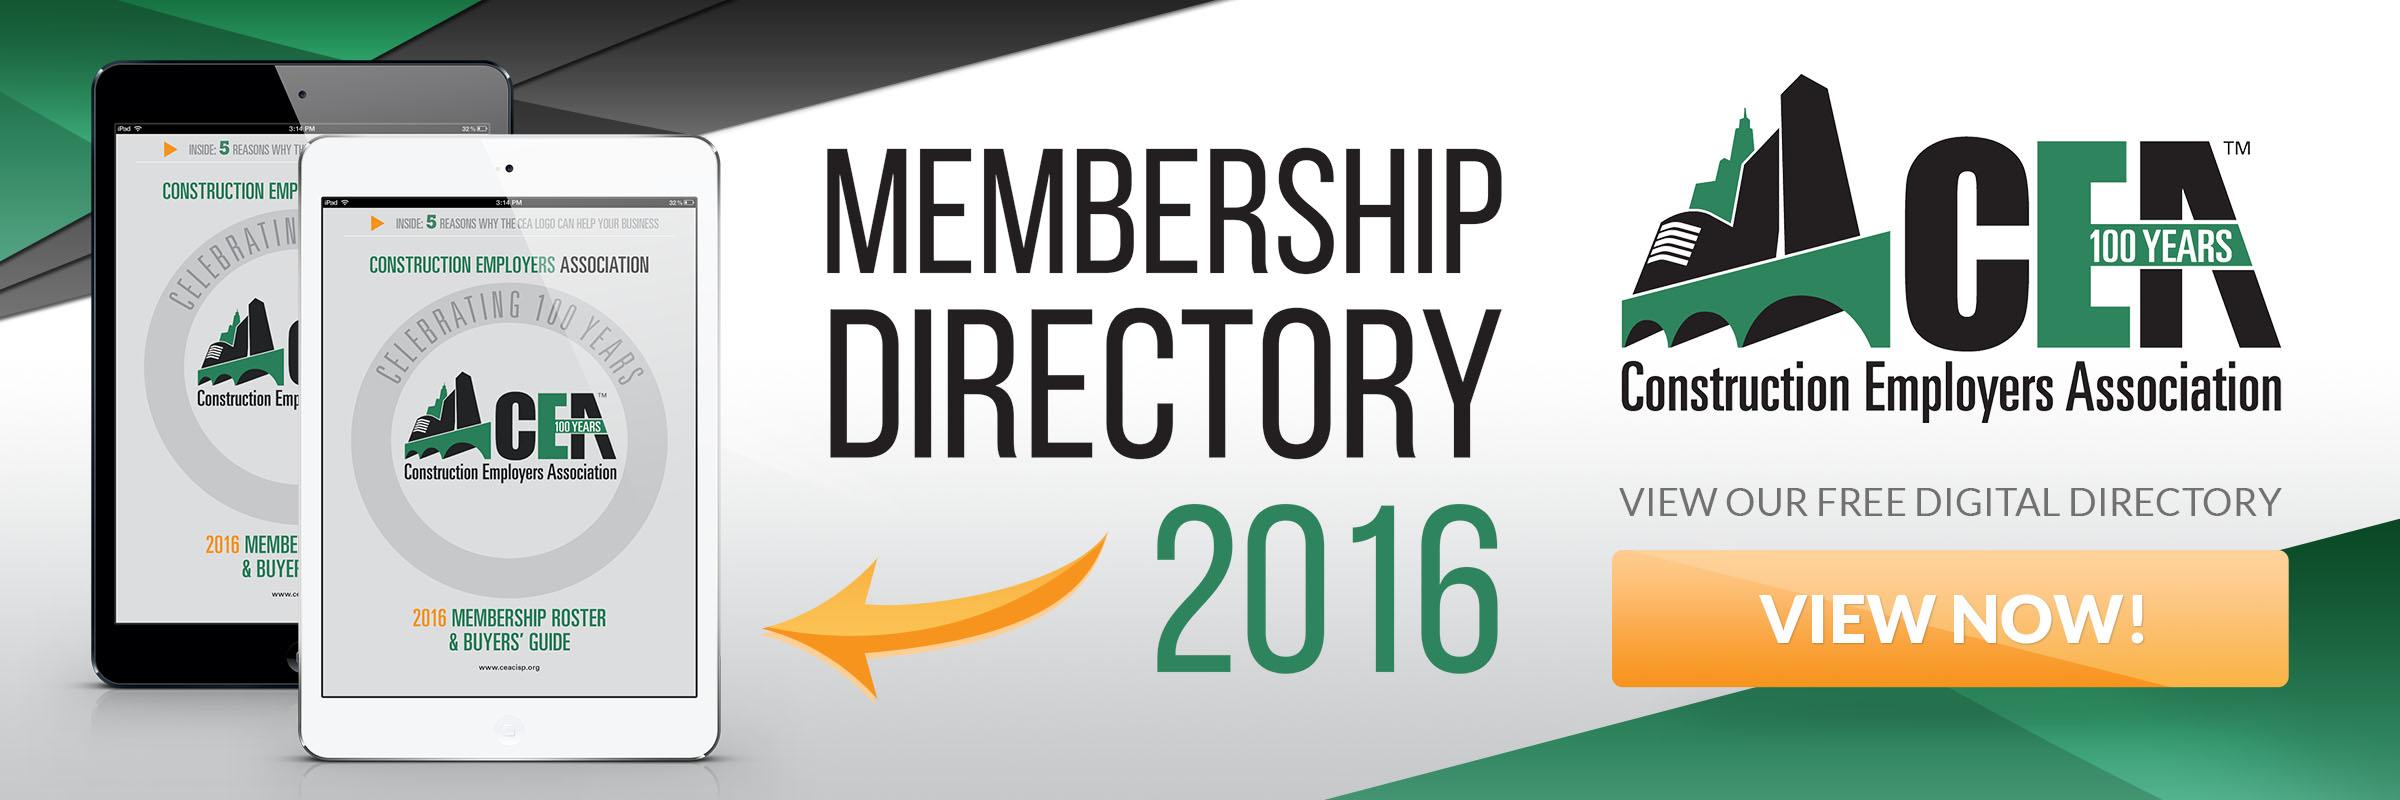 CEA Membership Directory 2016